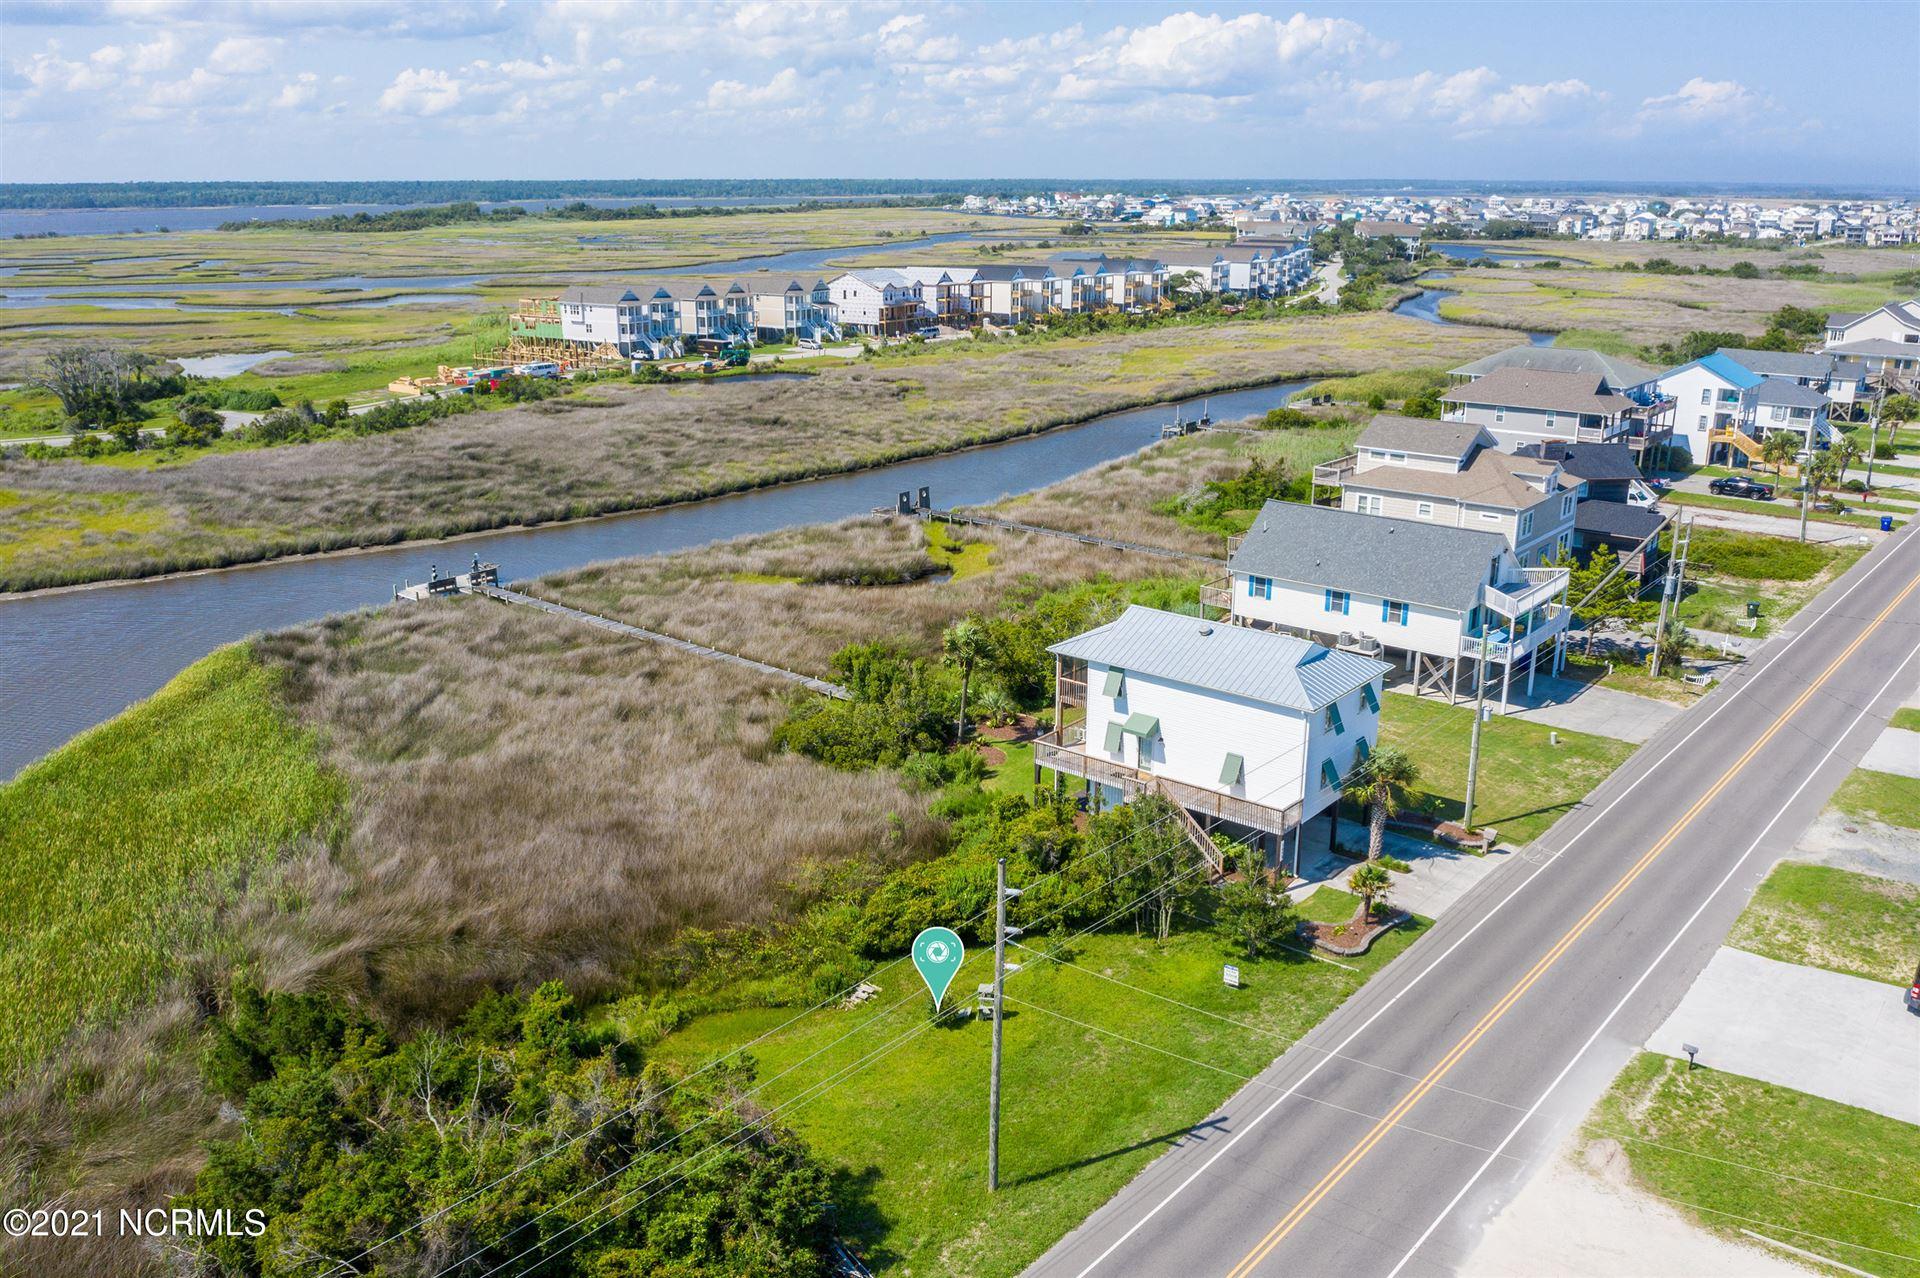 Photo of Lots 24a/B N New River Drive, Surf City, NC 28445 (MLS # 100283890)